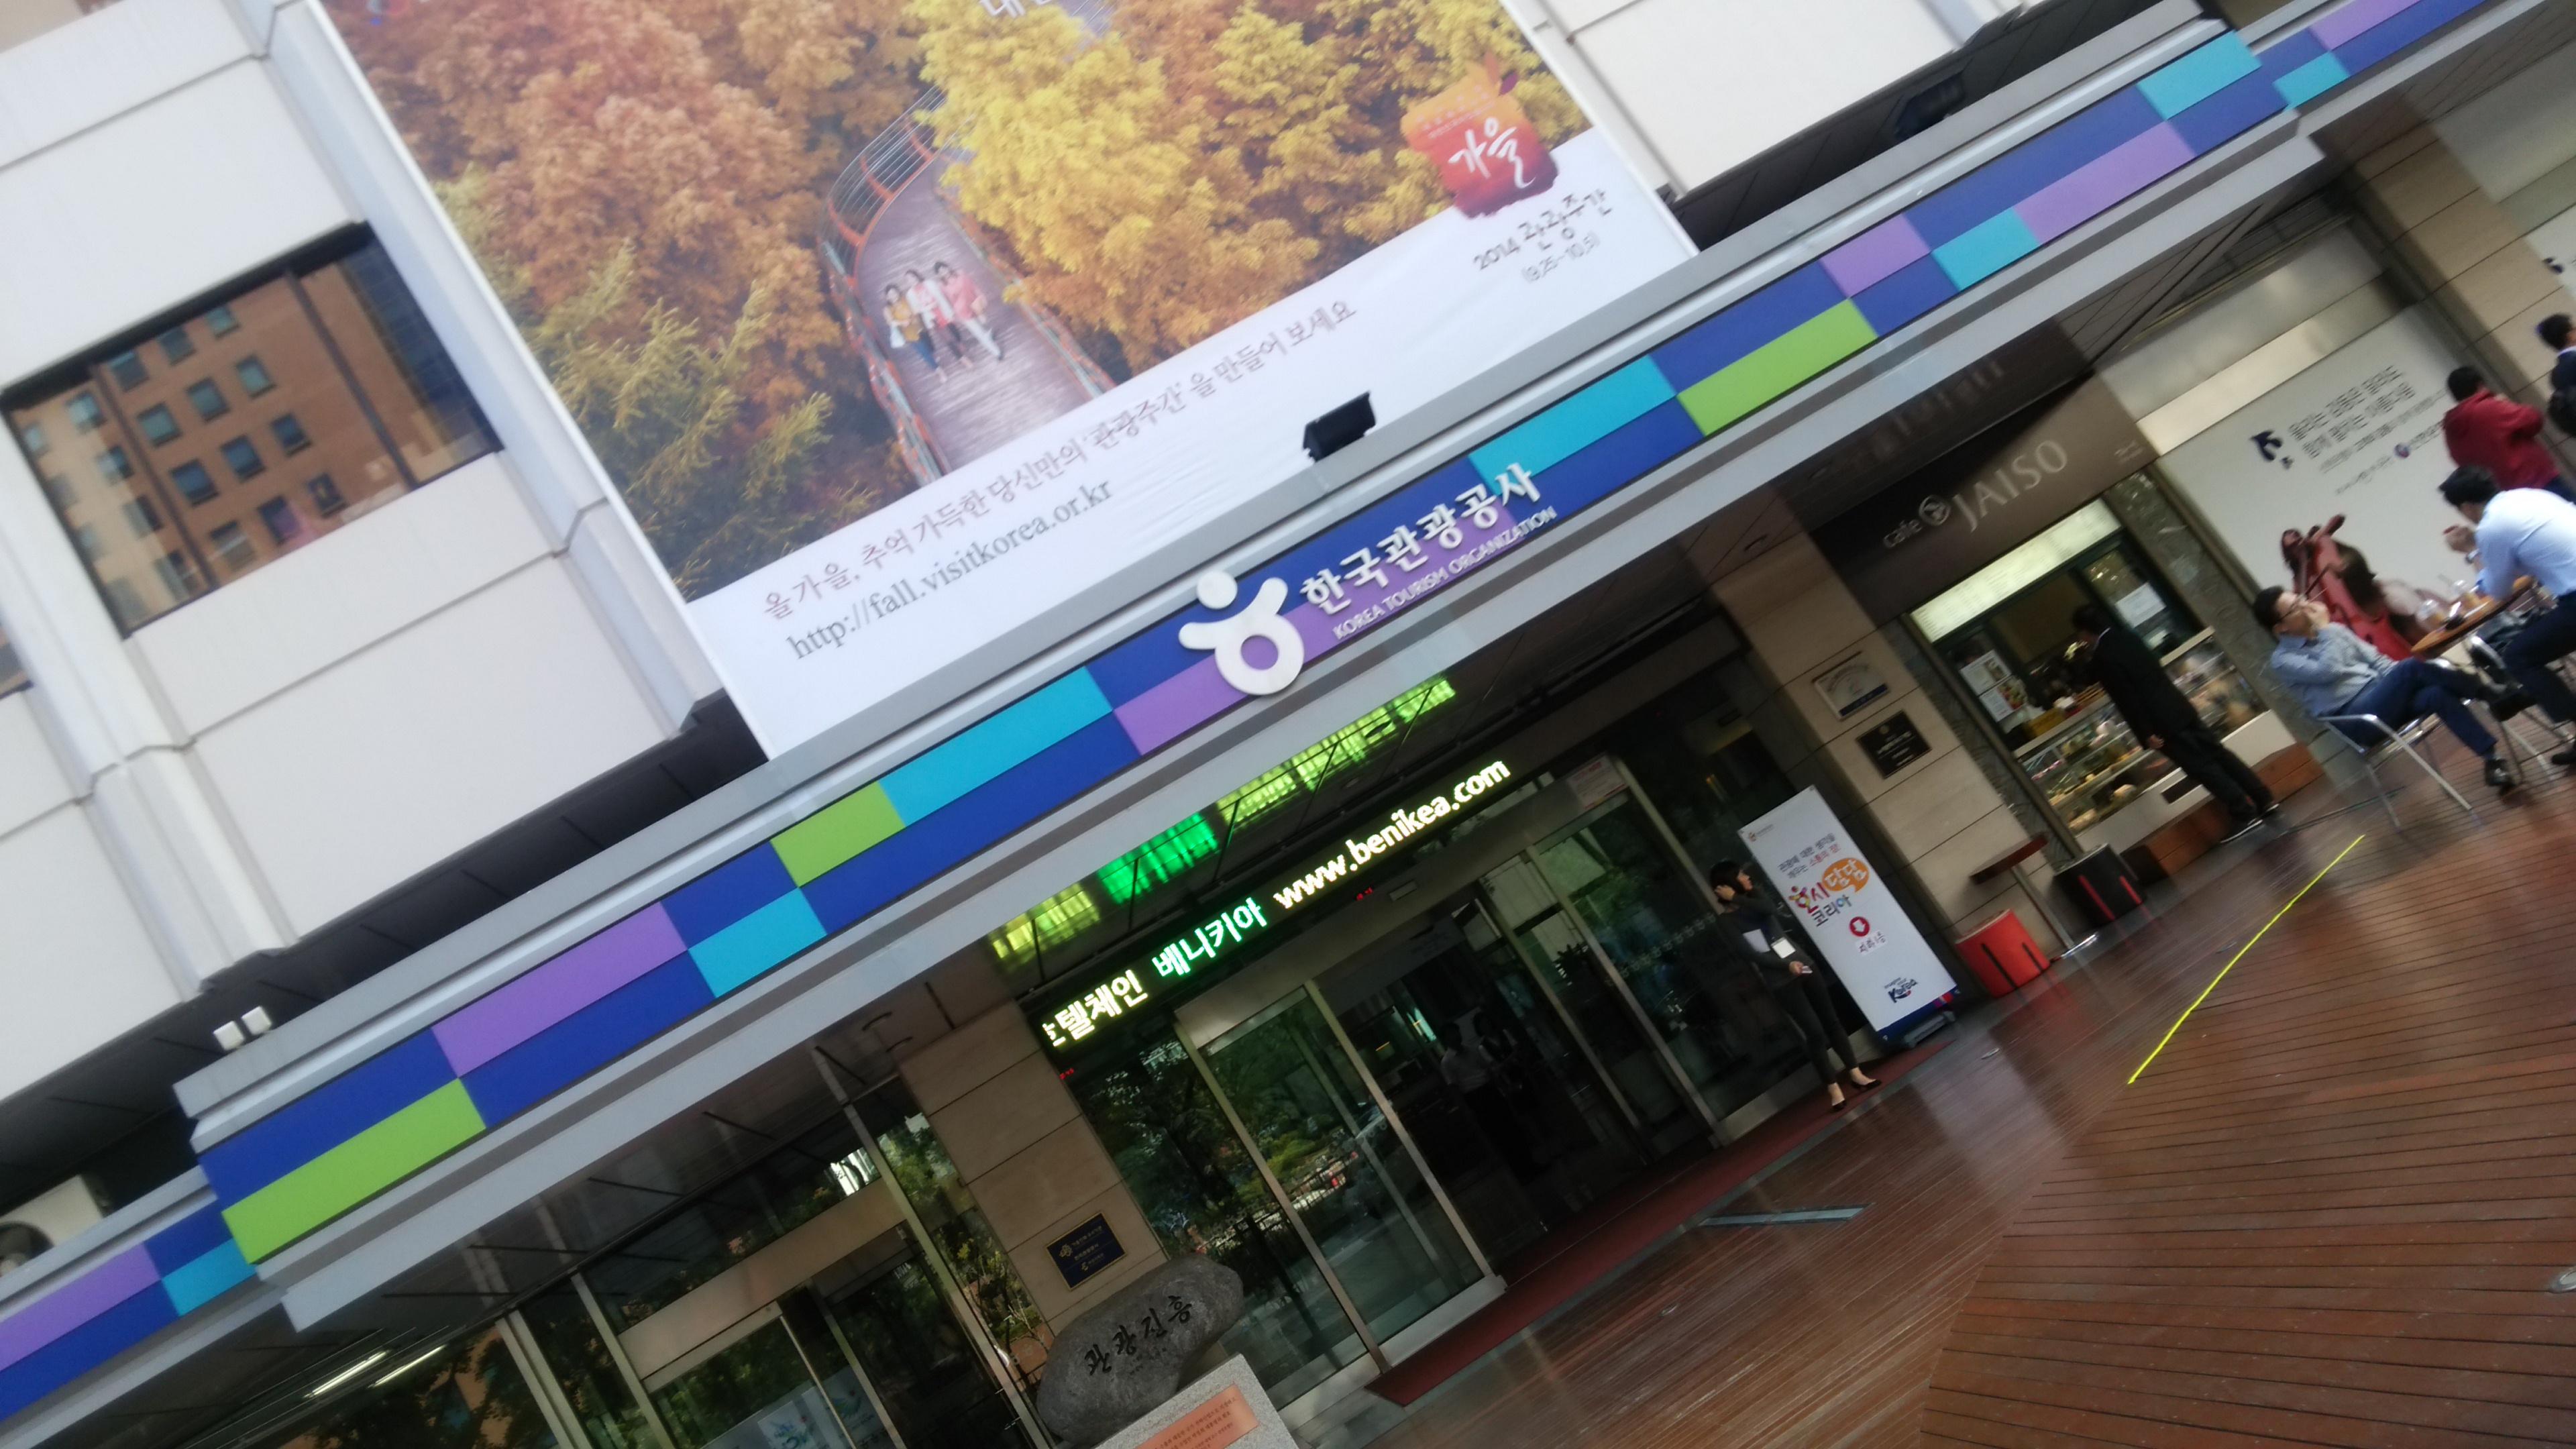 201409韓国 韓国観光公社へ♪